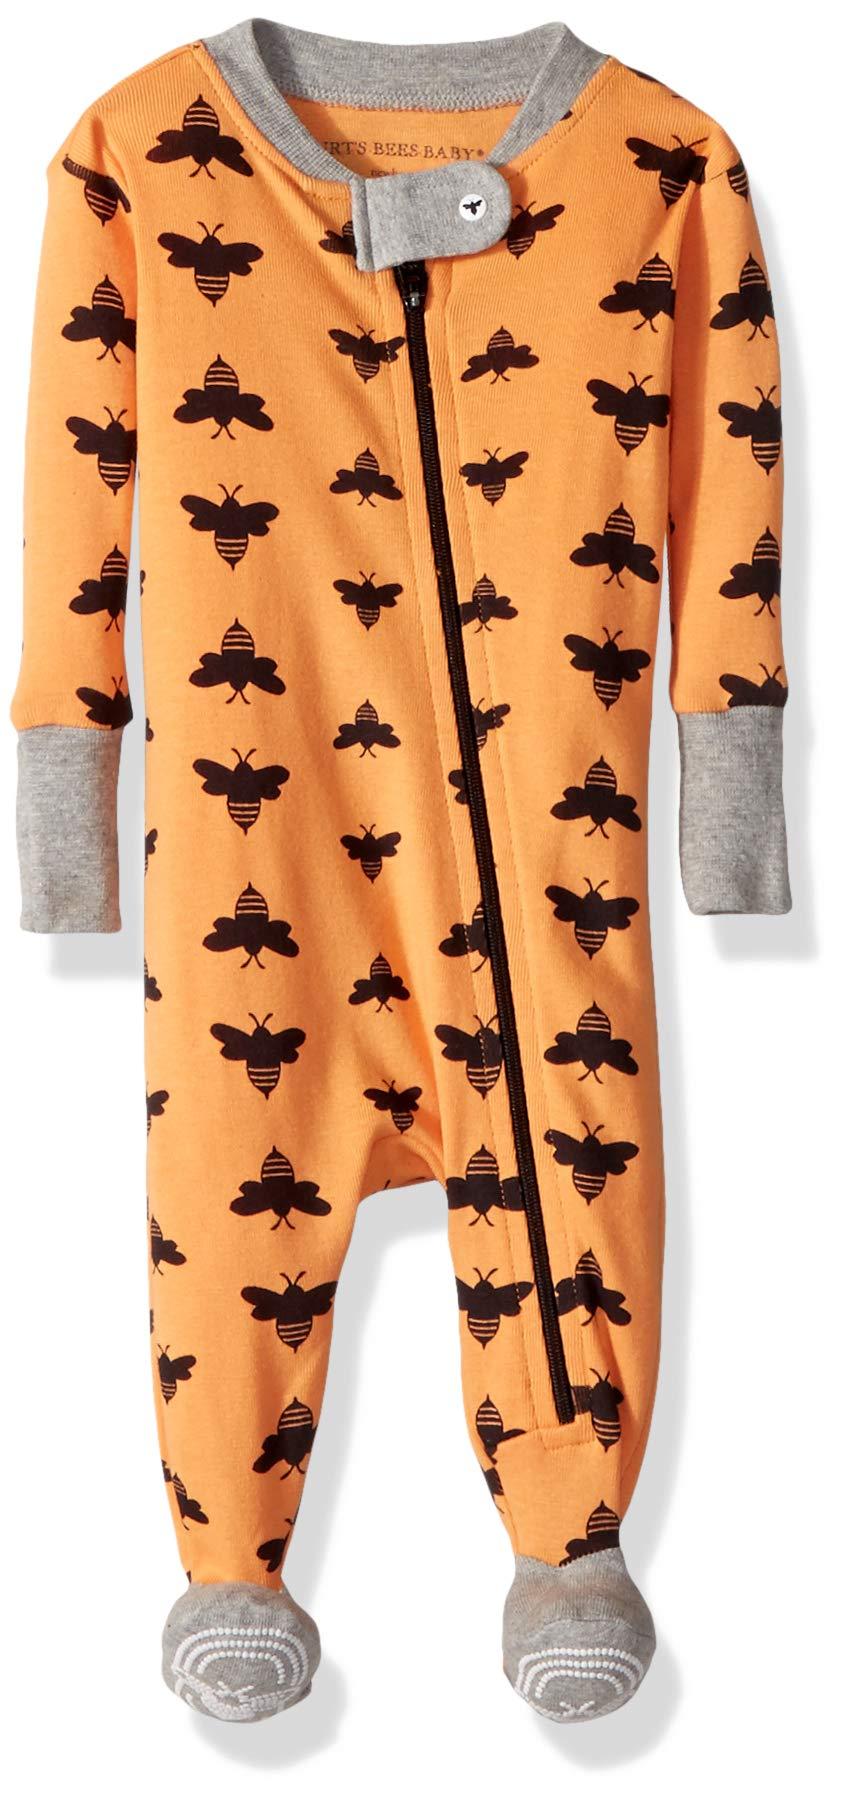 Sleeper Pajamas, Zip Front Non-Slip Footed Sleeper PJs, 100% Organic Cotton